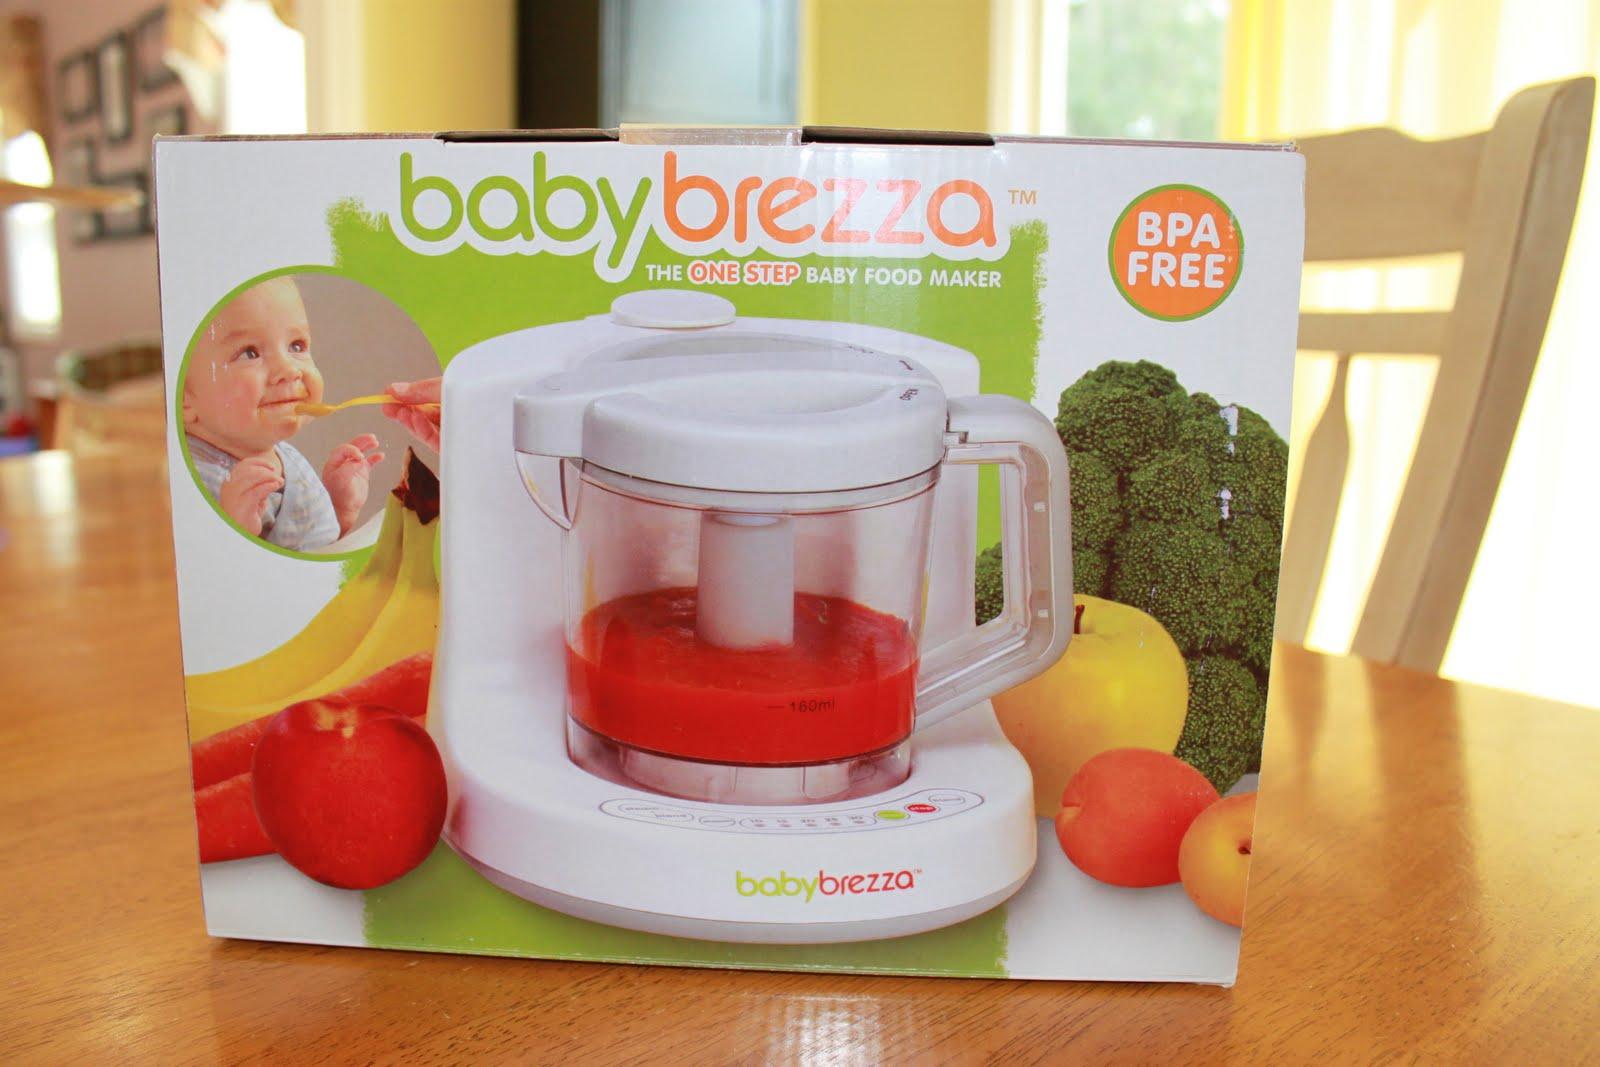 Baby Brezza Bpa Free One Step Baby Food Maker